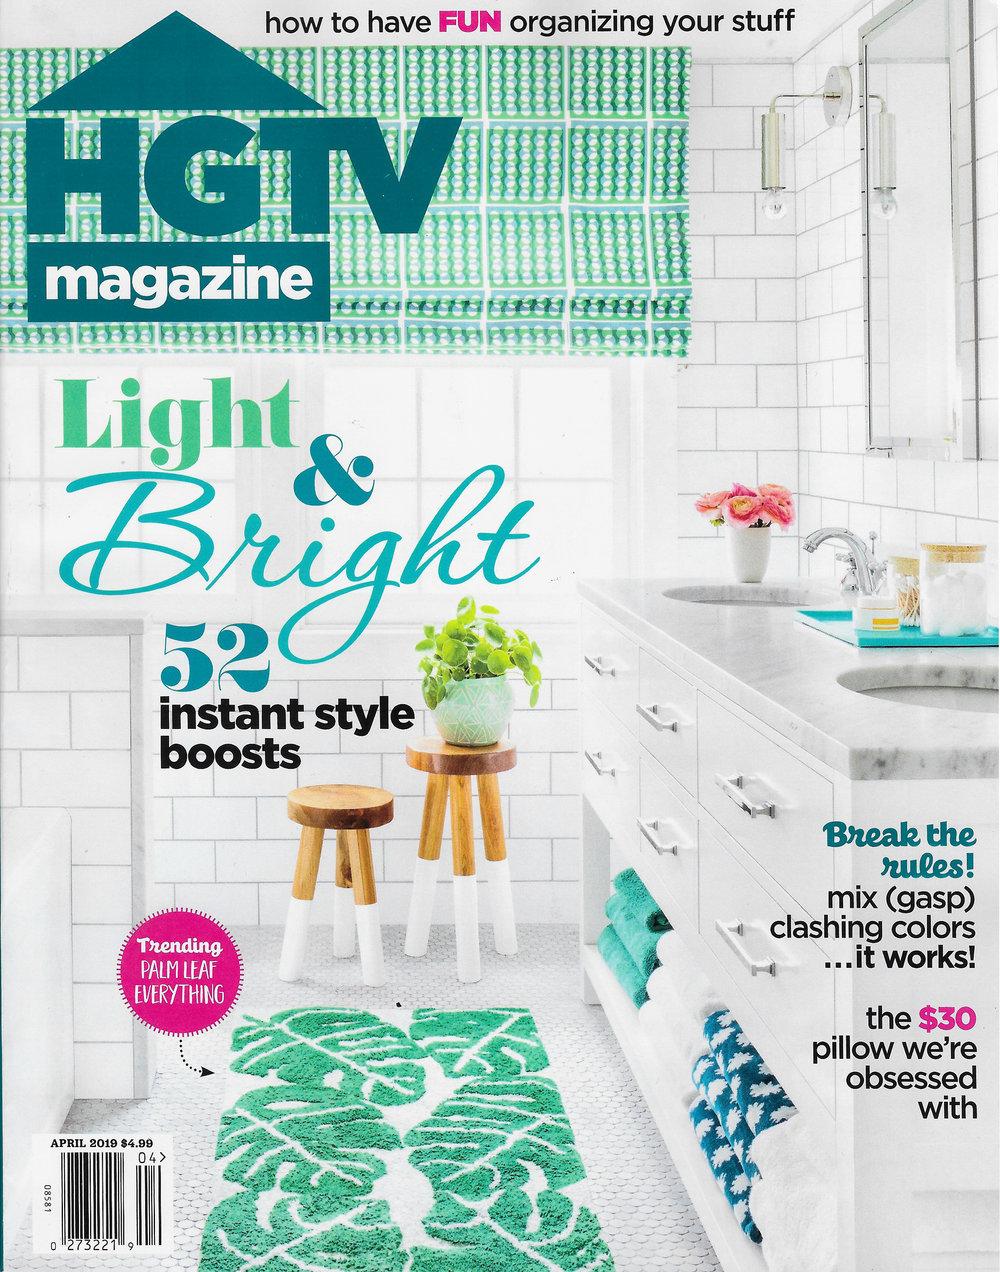 HGTV Magazine April 2019.jpg